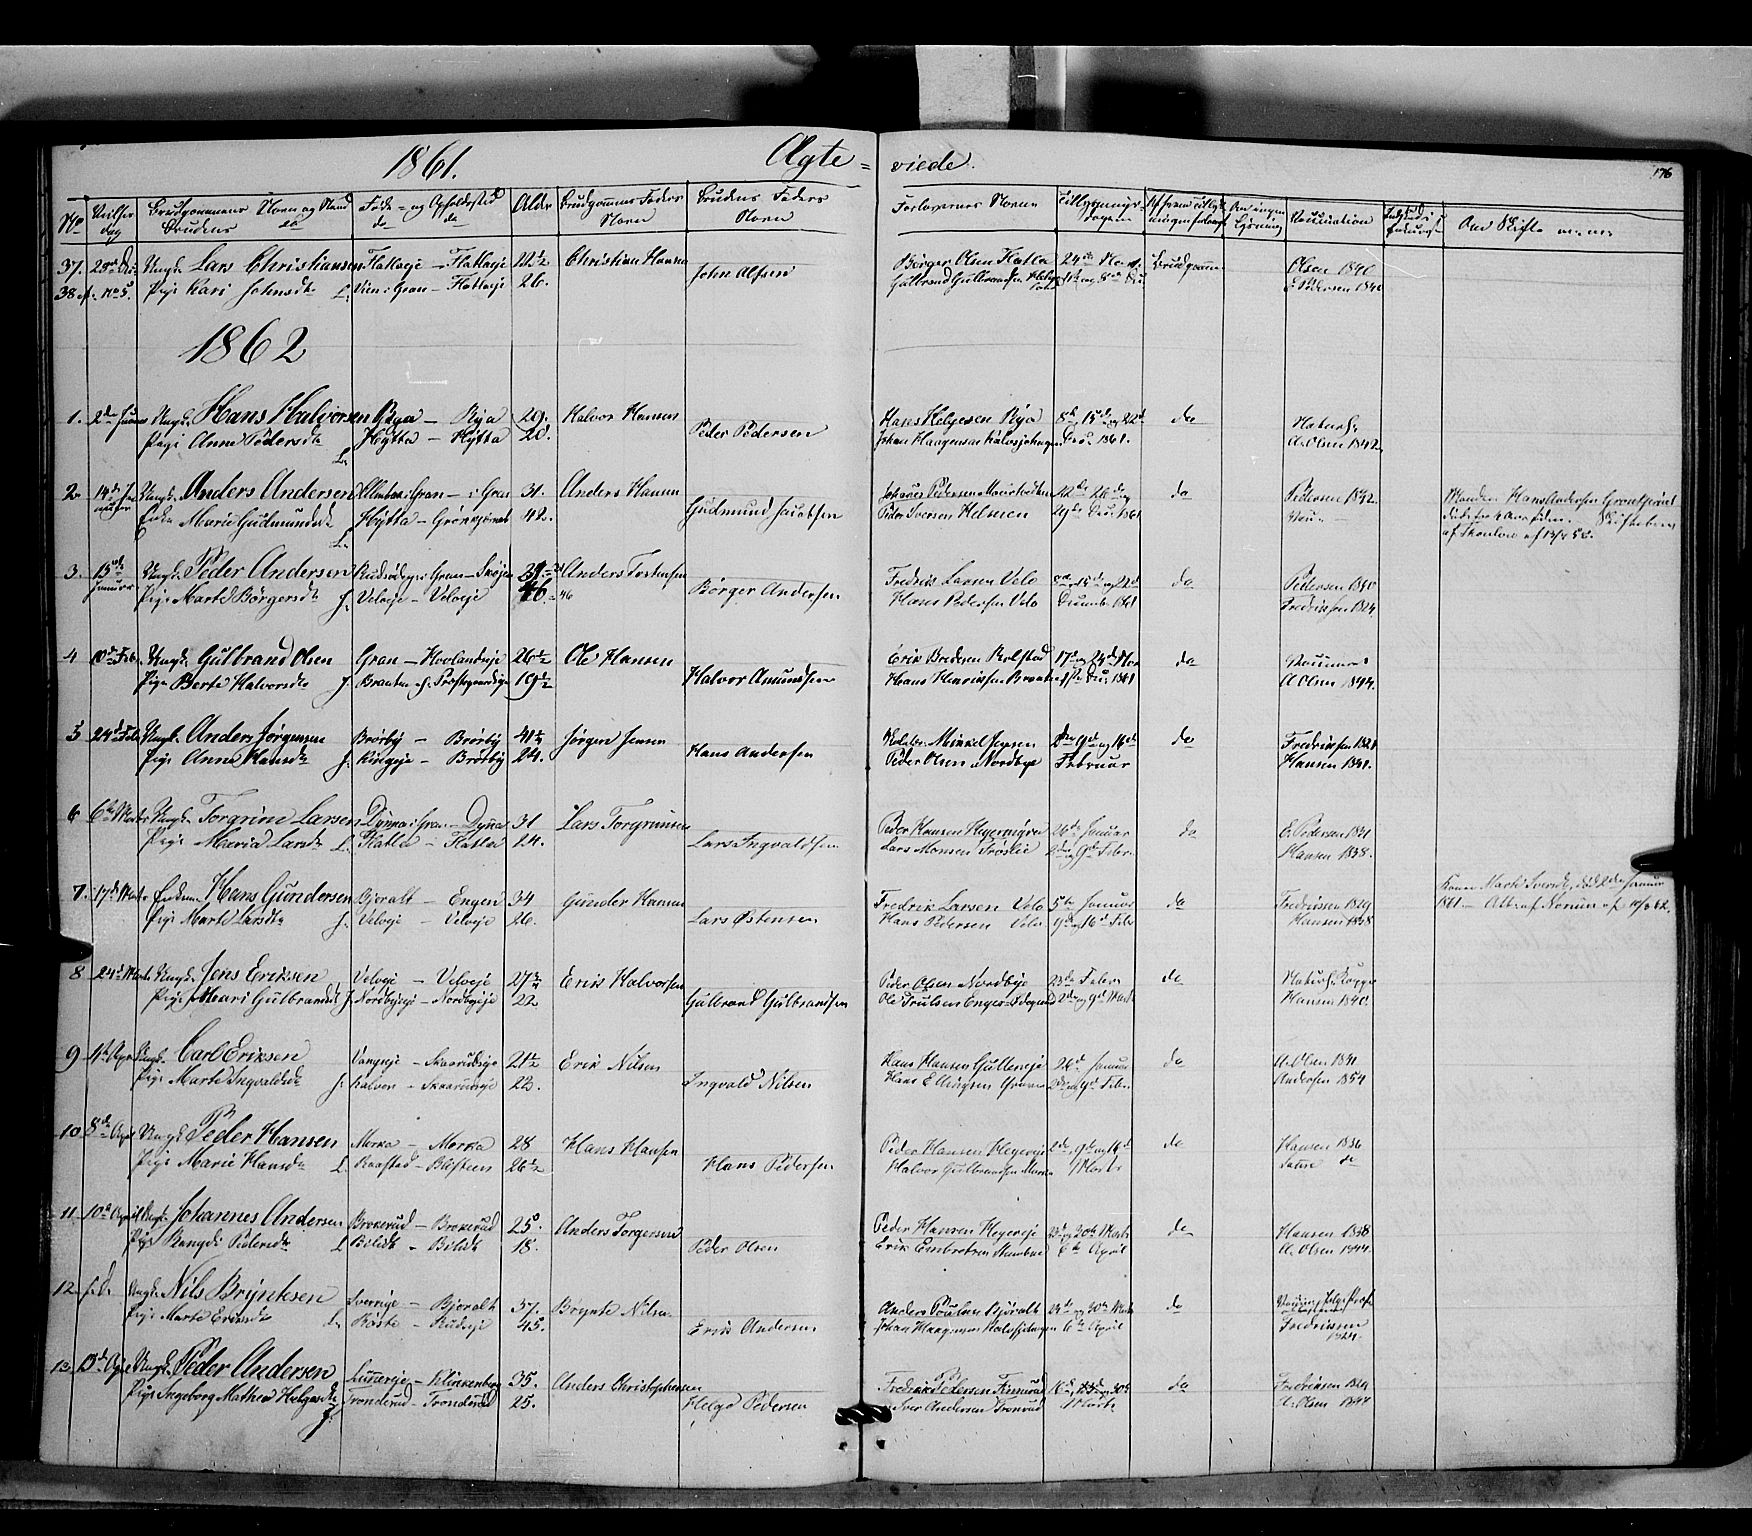 SAH, Jevnaker prestekontor, Ministerialbok nr. 7, 1858-1876, s. 176